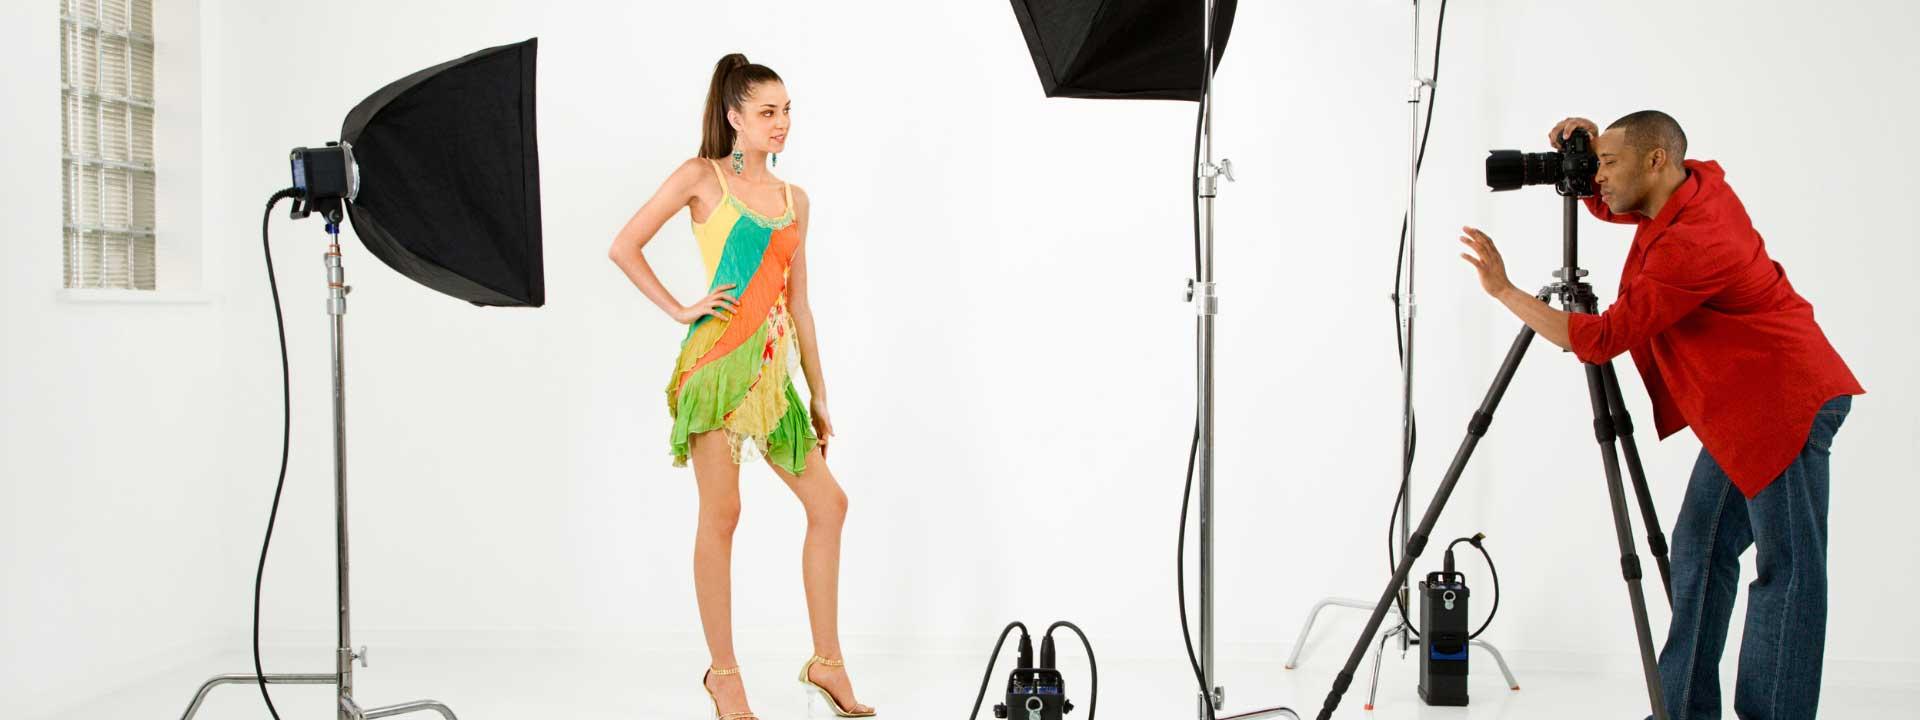 photographer shooting a model